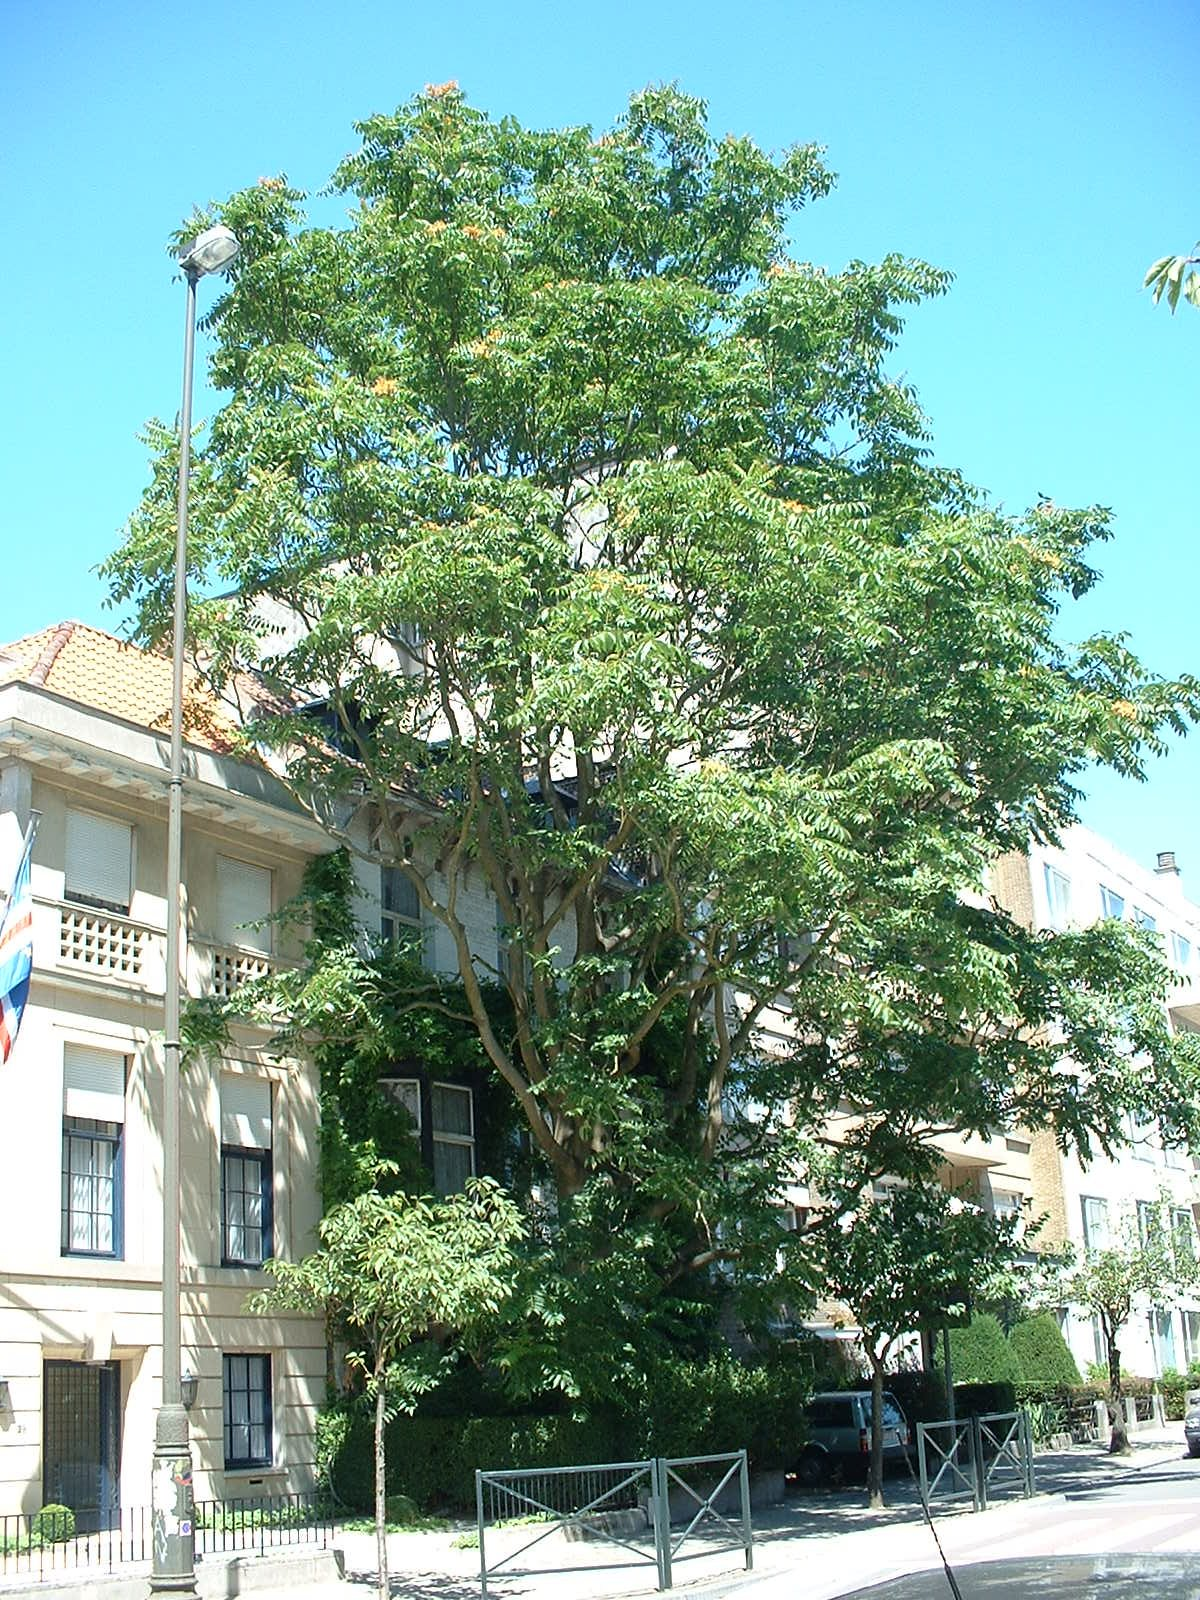 Hemelboom – Brussel, Johannalaan, 27 –  14 Juli 2003